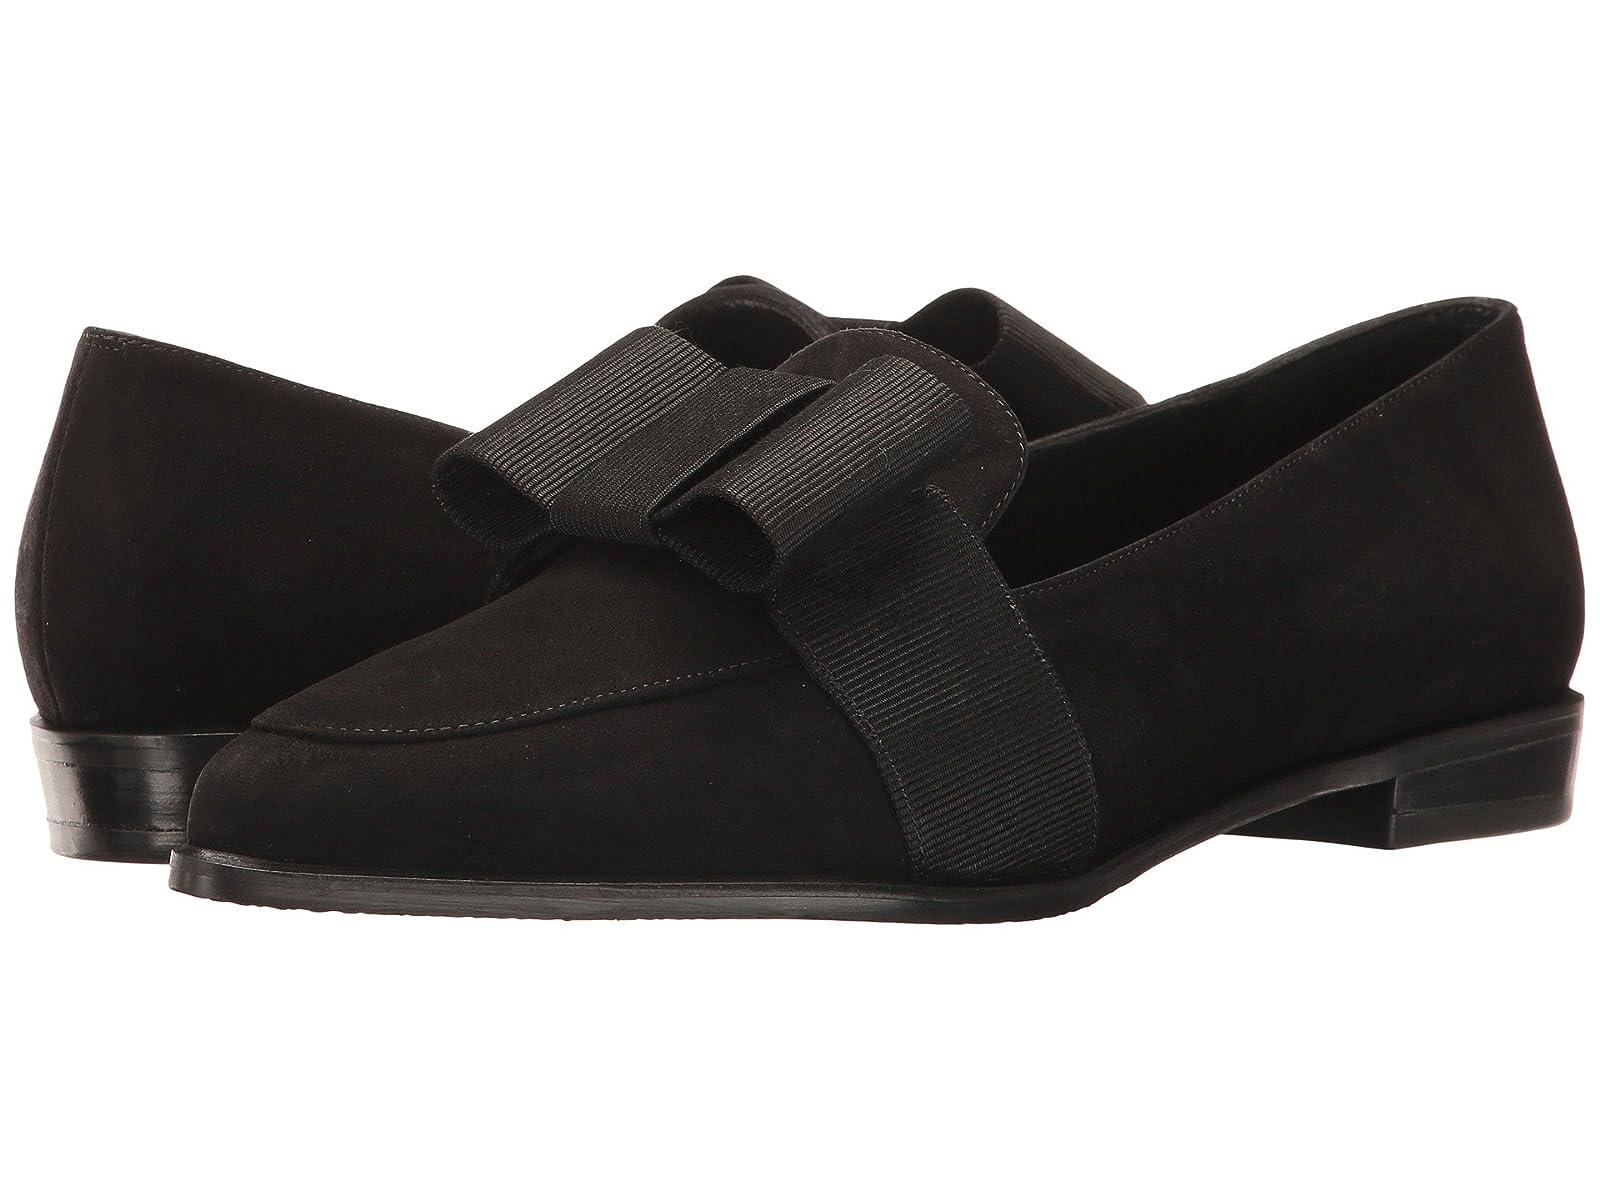 Stuart Weitzman TuxarkanaCheap and distinctive eye-catching shoes